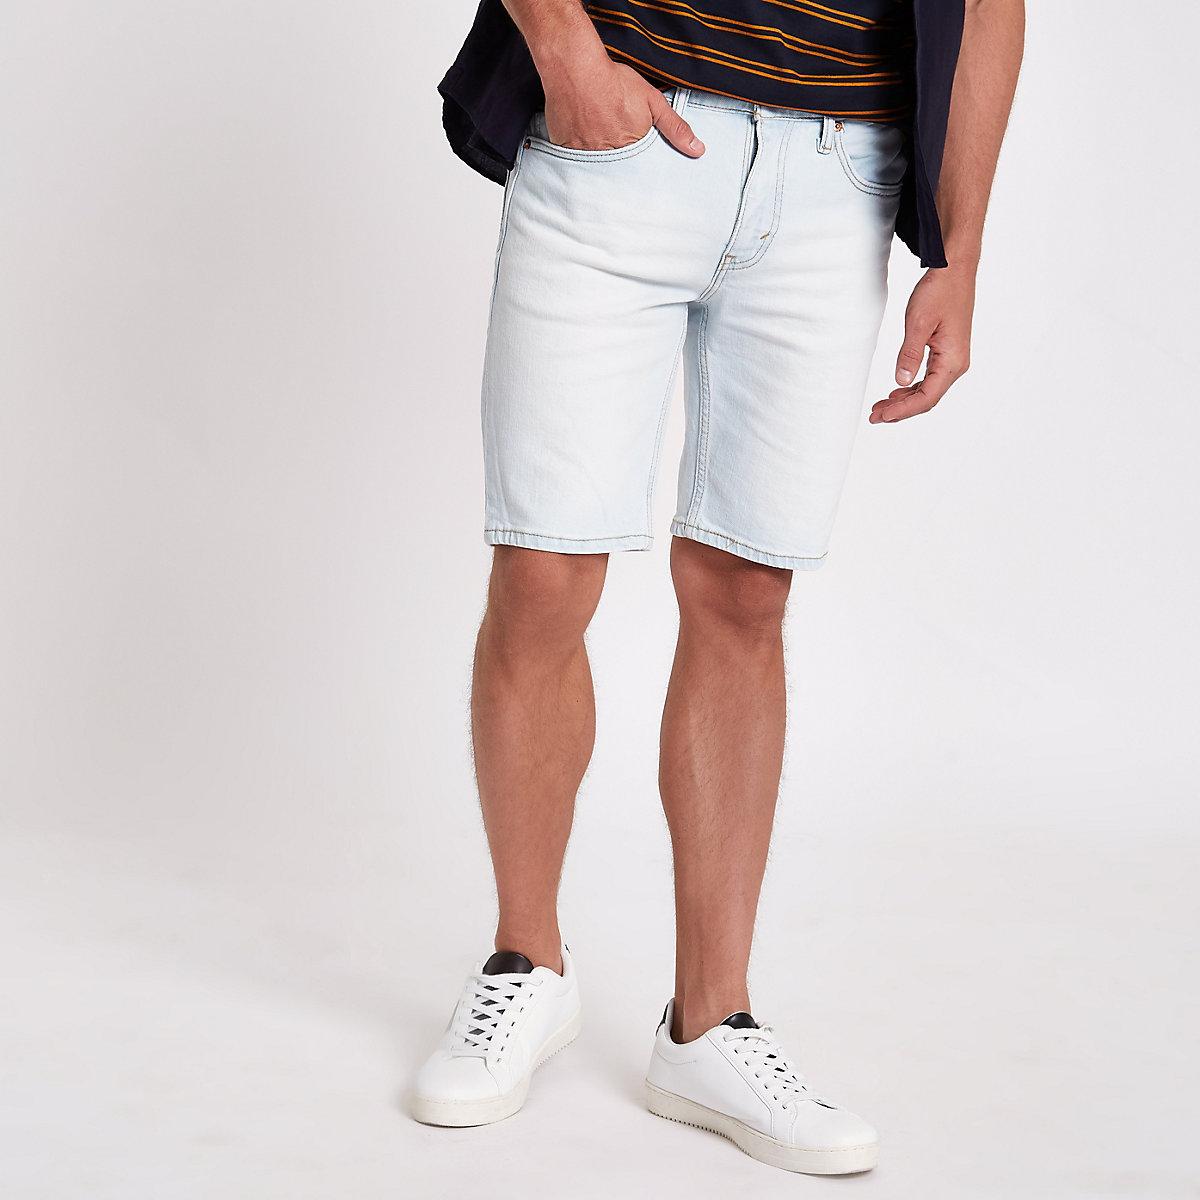 Levi's light blue 511 slim fit denim shorts